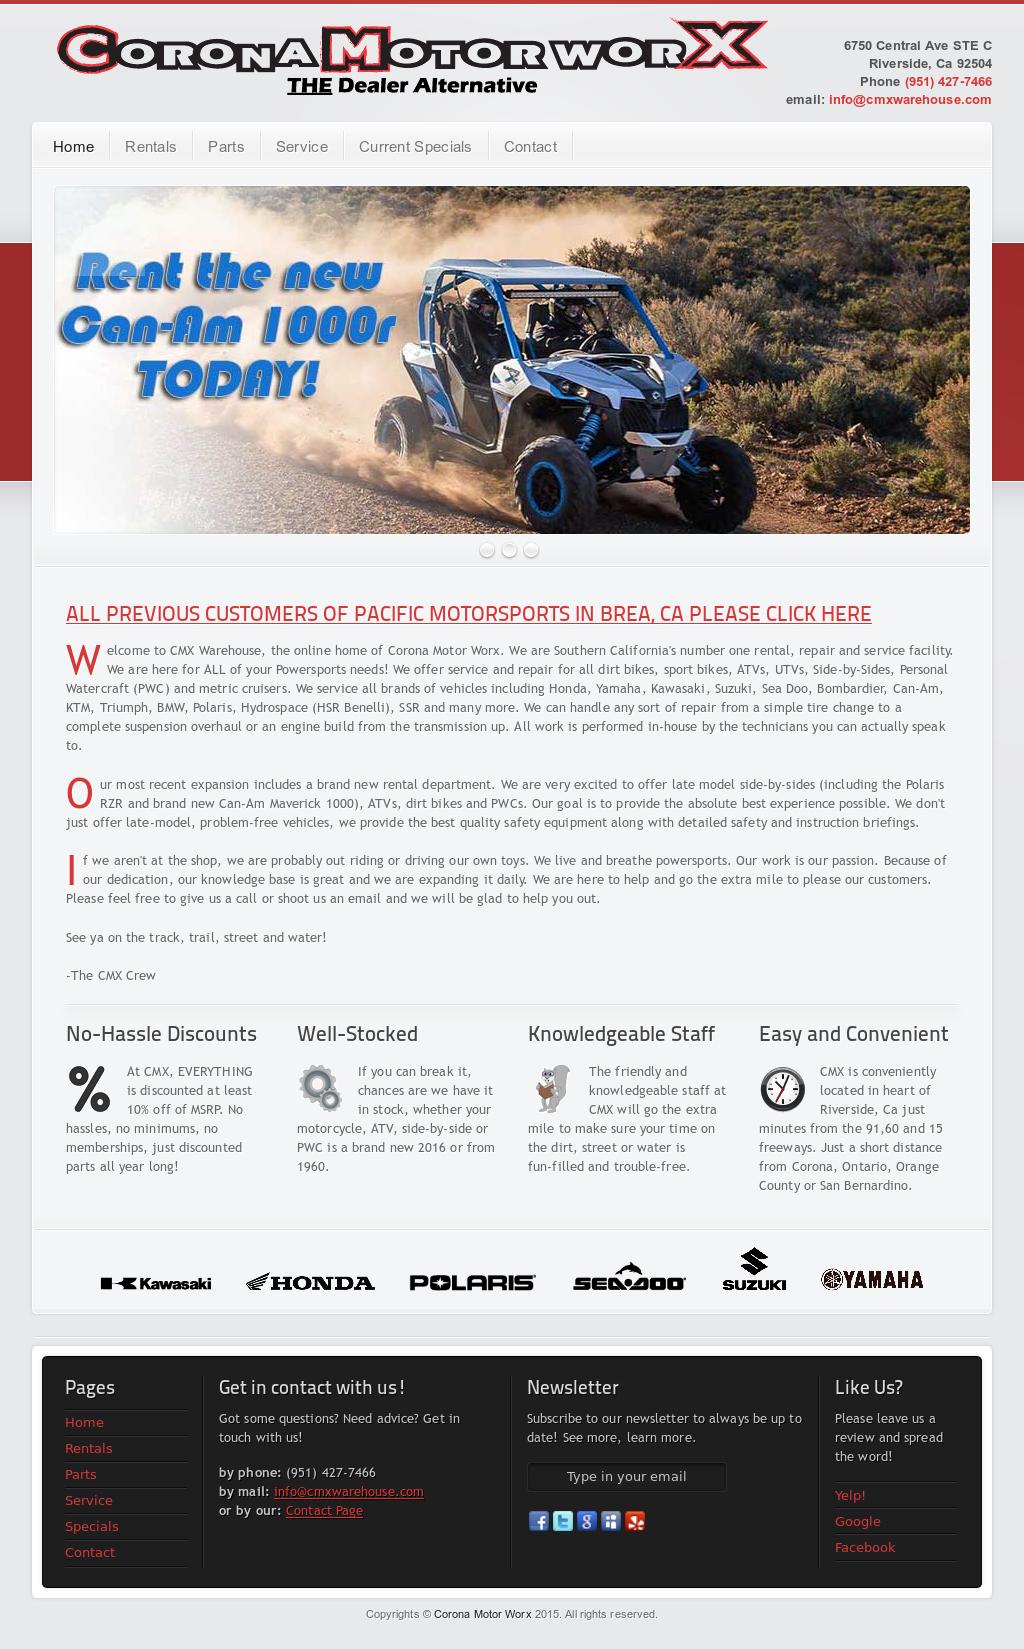 Corona Motor Worx Competitors, Revenue and Employees - Owler Company Profile